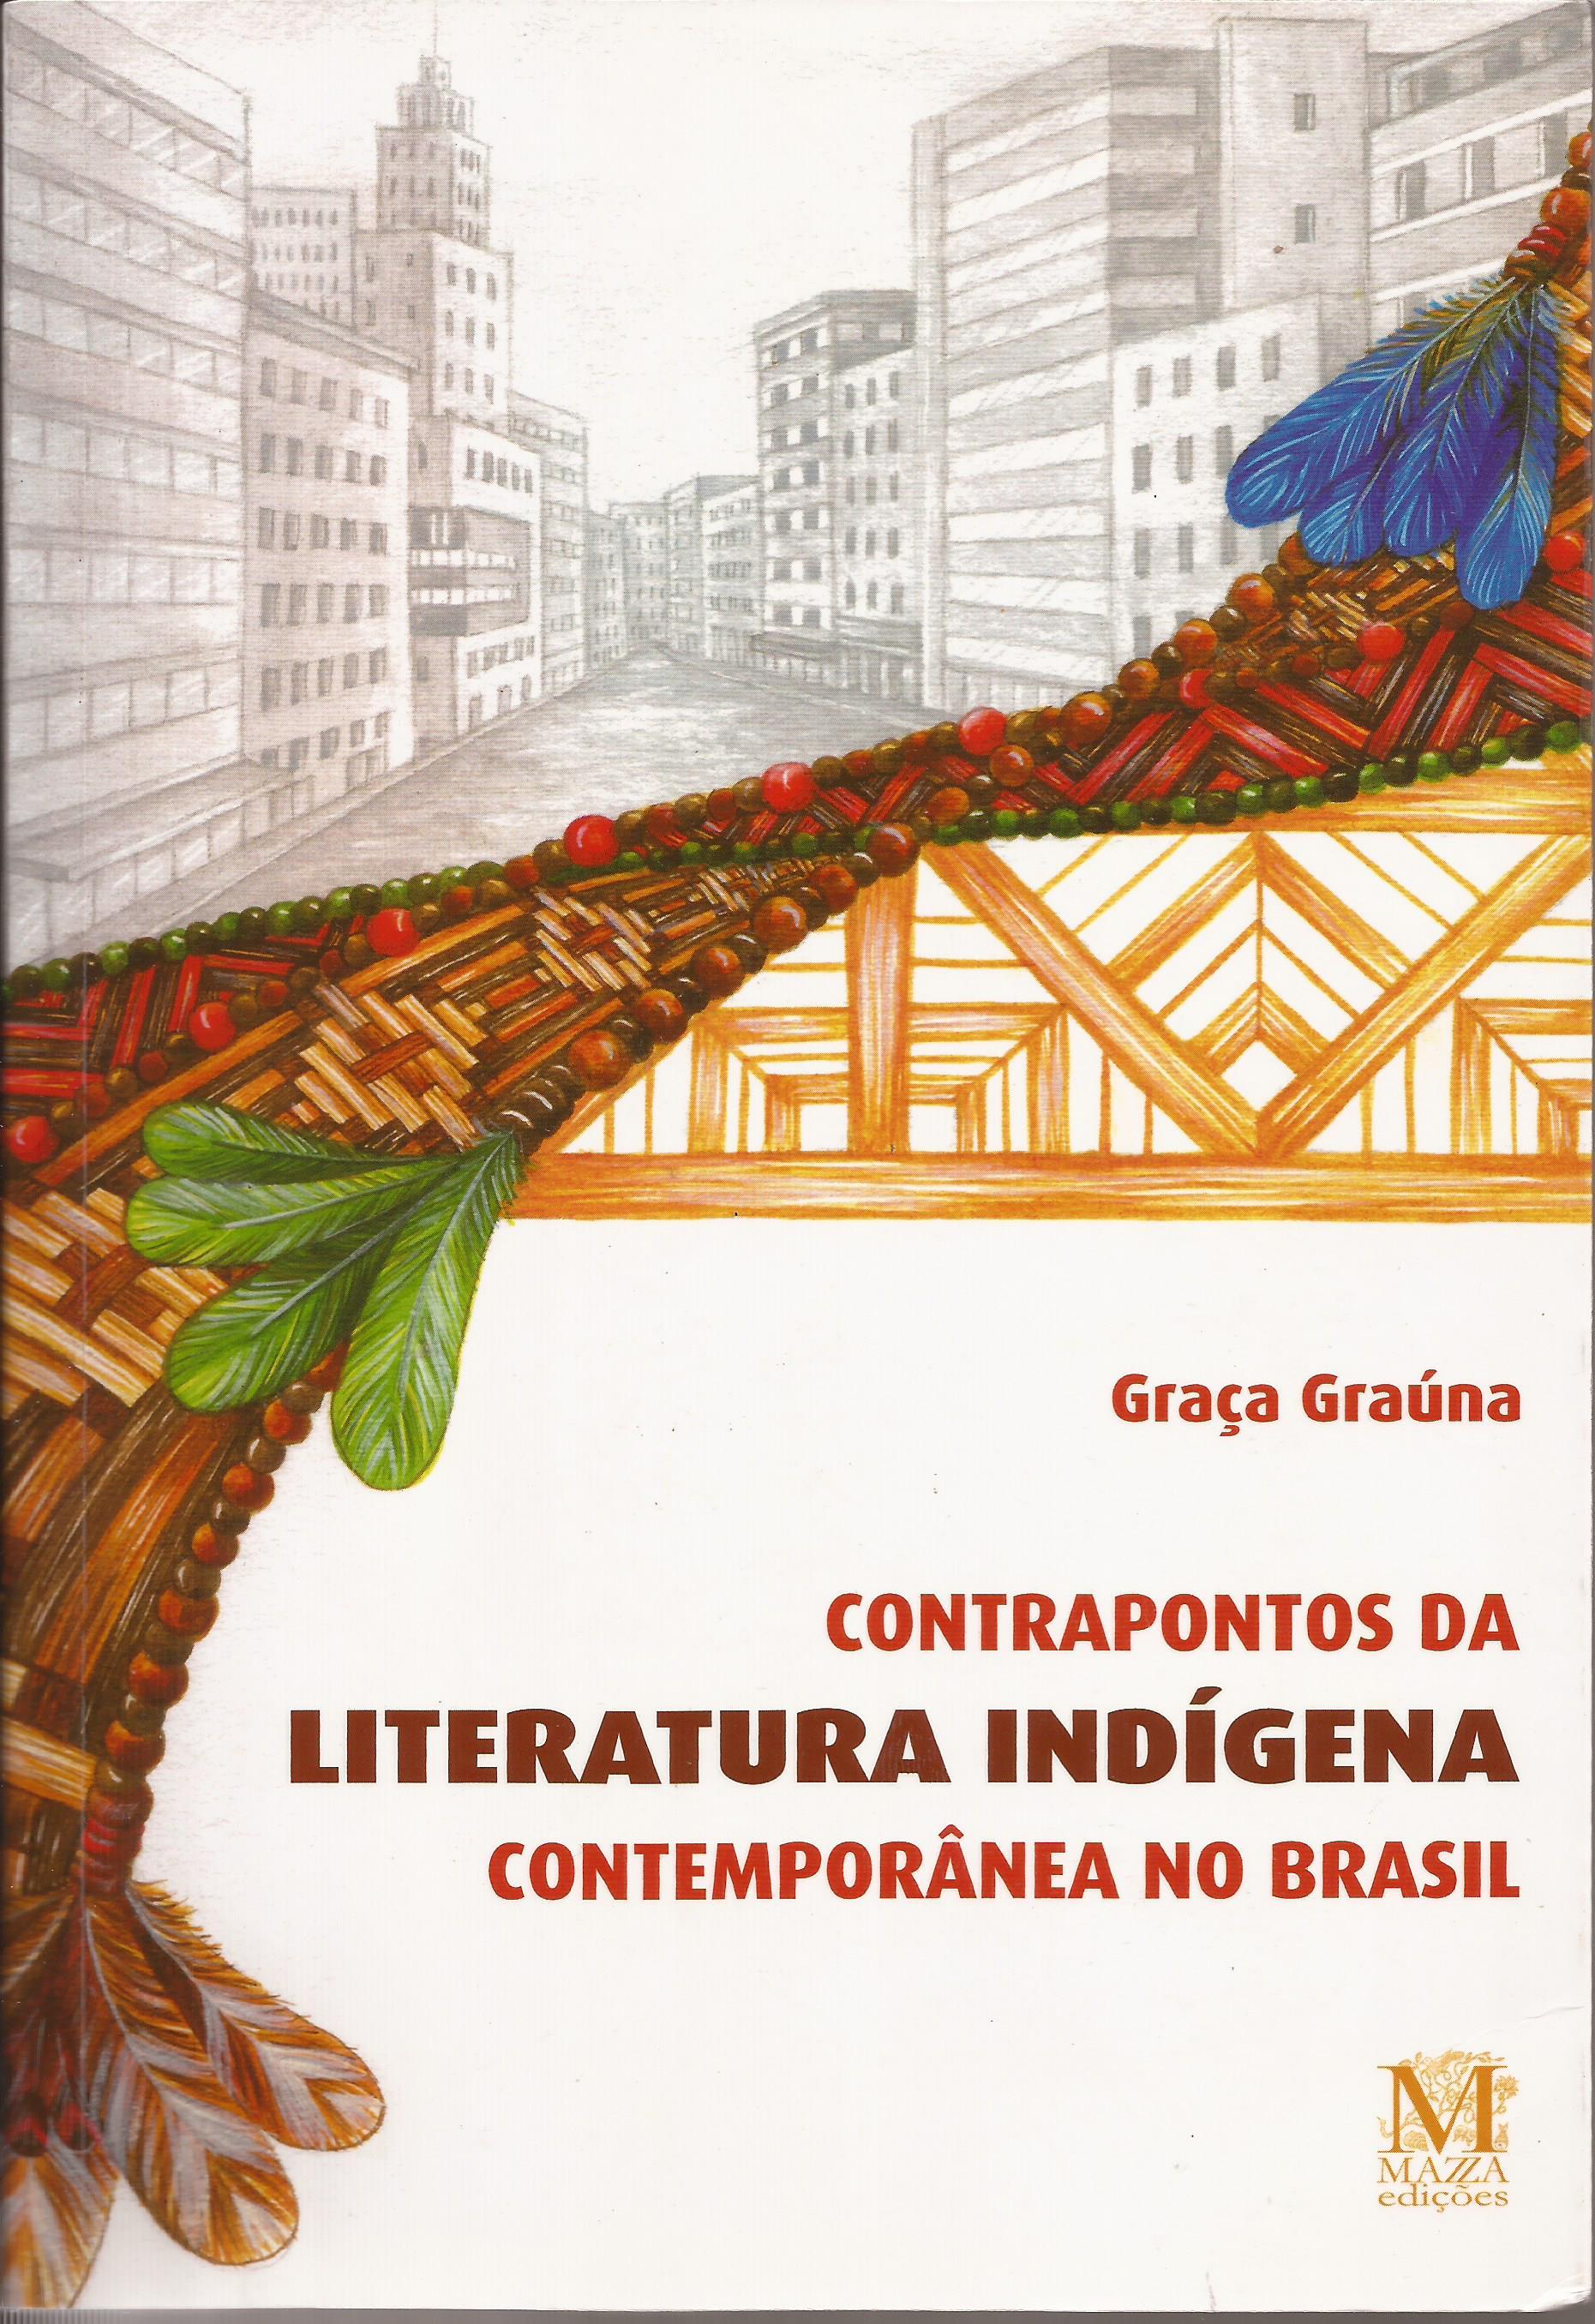 Contrapontos da Literatura Indígena contemporânea no Brasil